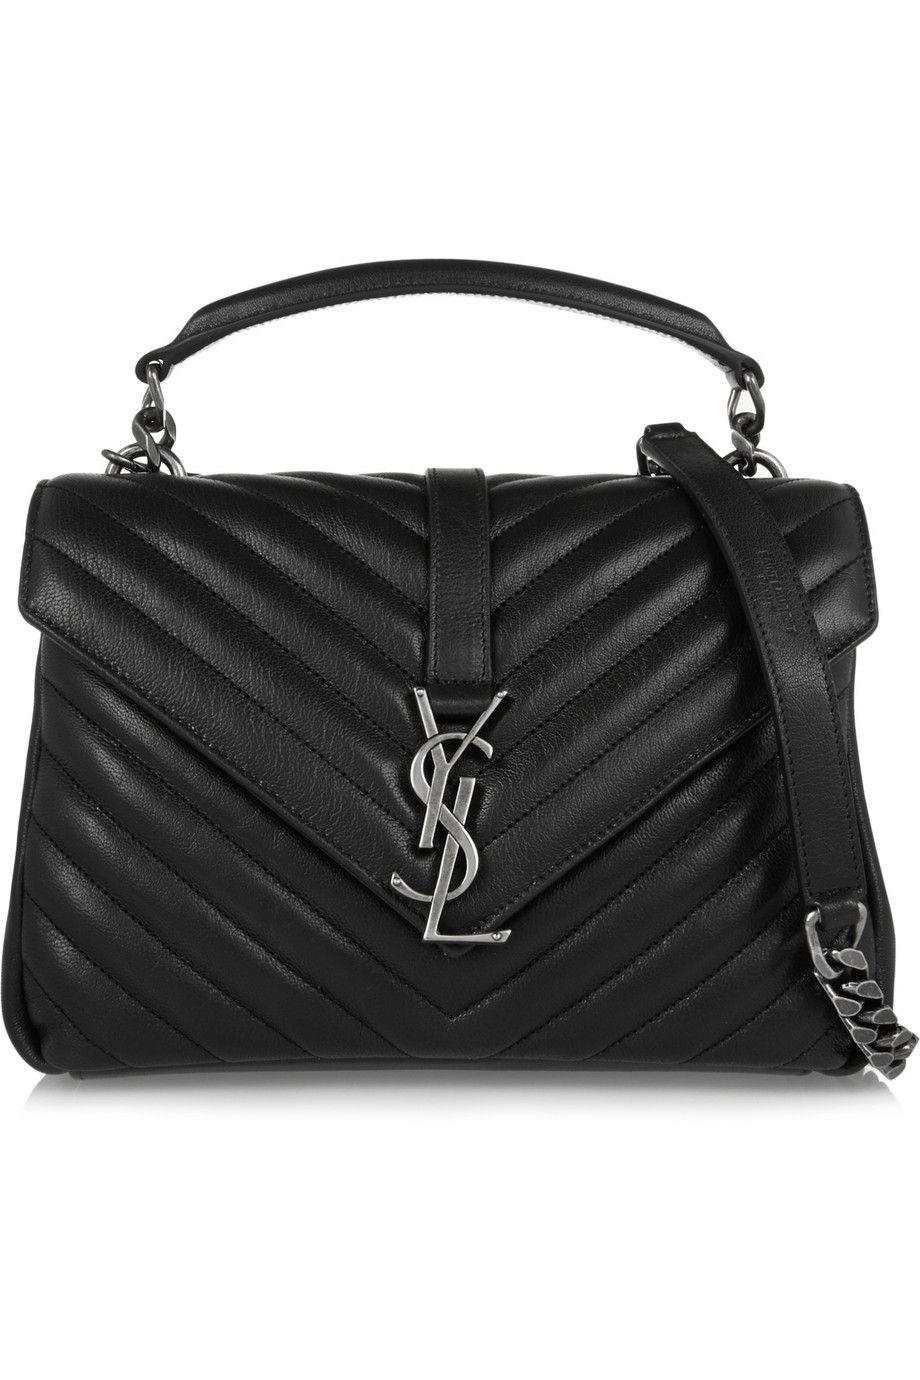 saintlaurent, CLASSIC Medium COLLèGE MONOGRAM SAINT LAURENT BAG IN Black  MATELASSÉ LEATHER USD 2450 at YSL   Perfect Hand Bags   Pinterest   Bags,  ... f95cff3ed4a